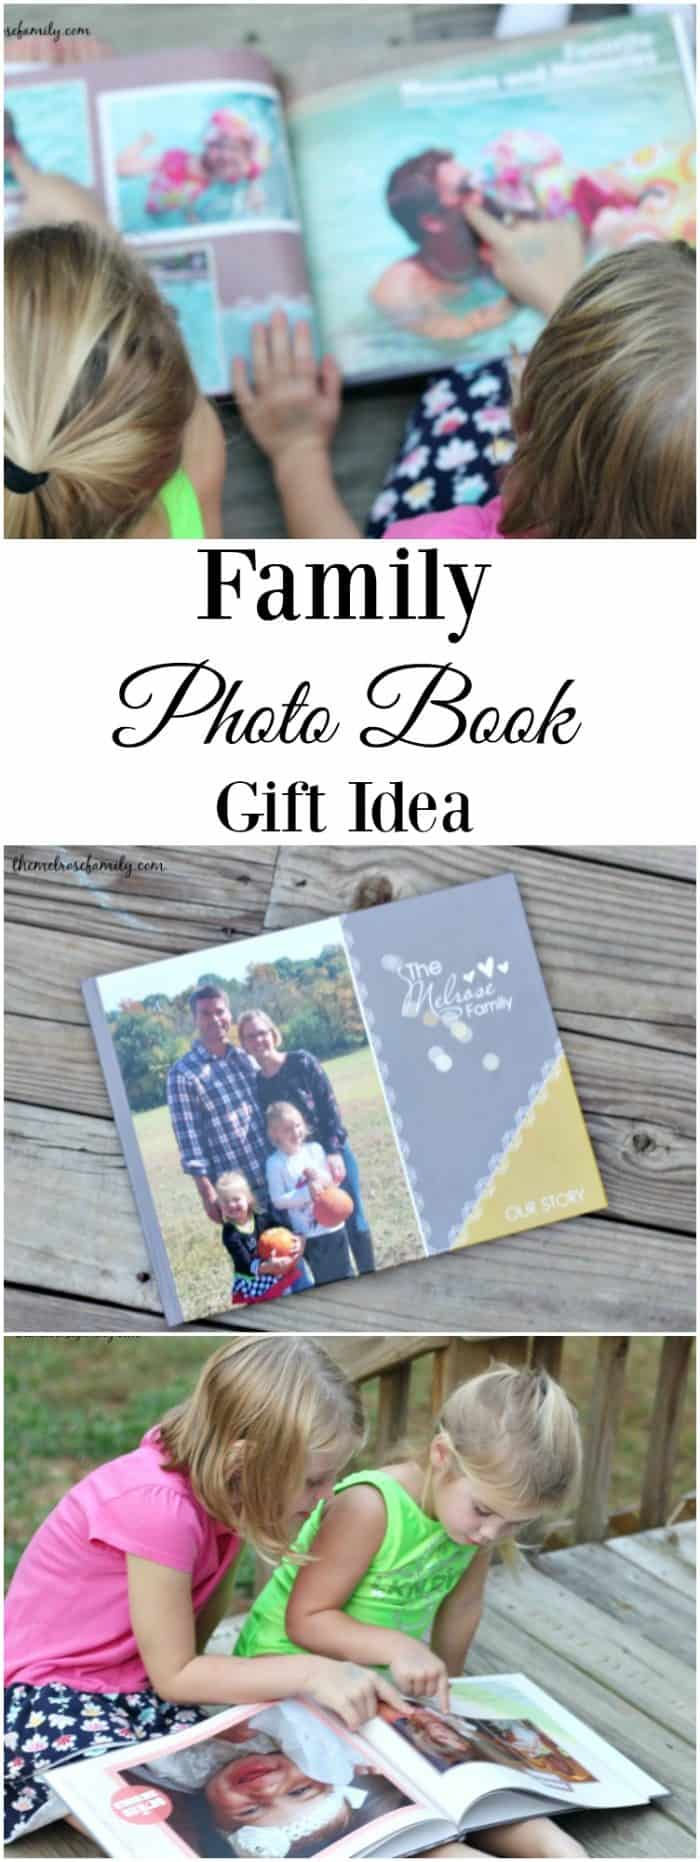 family-photo-book-gift-idea